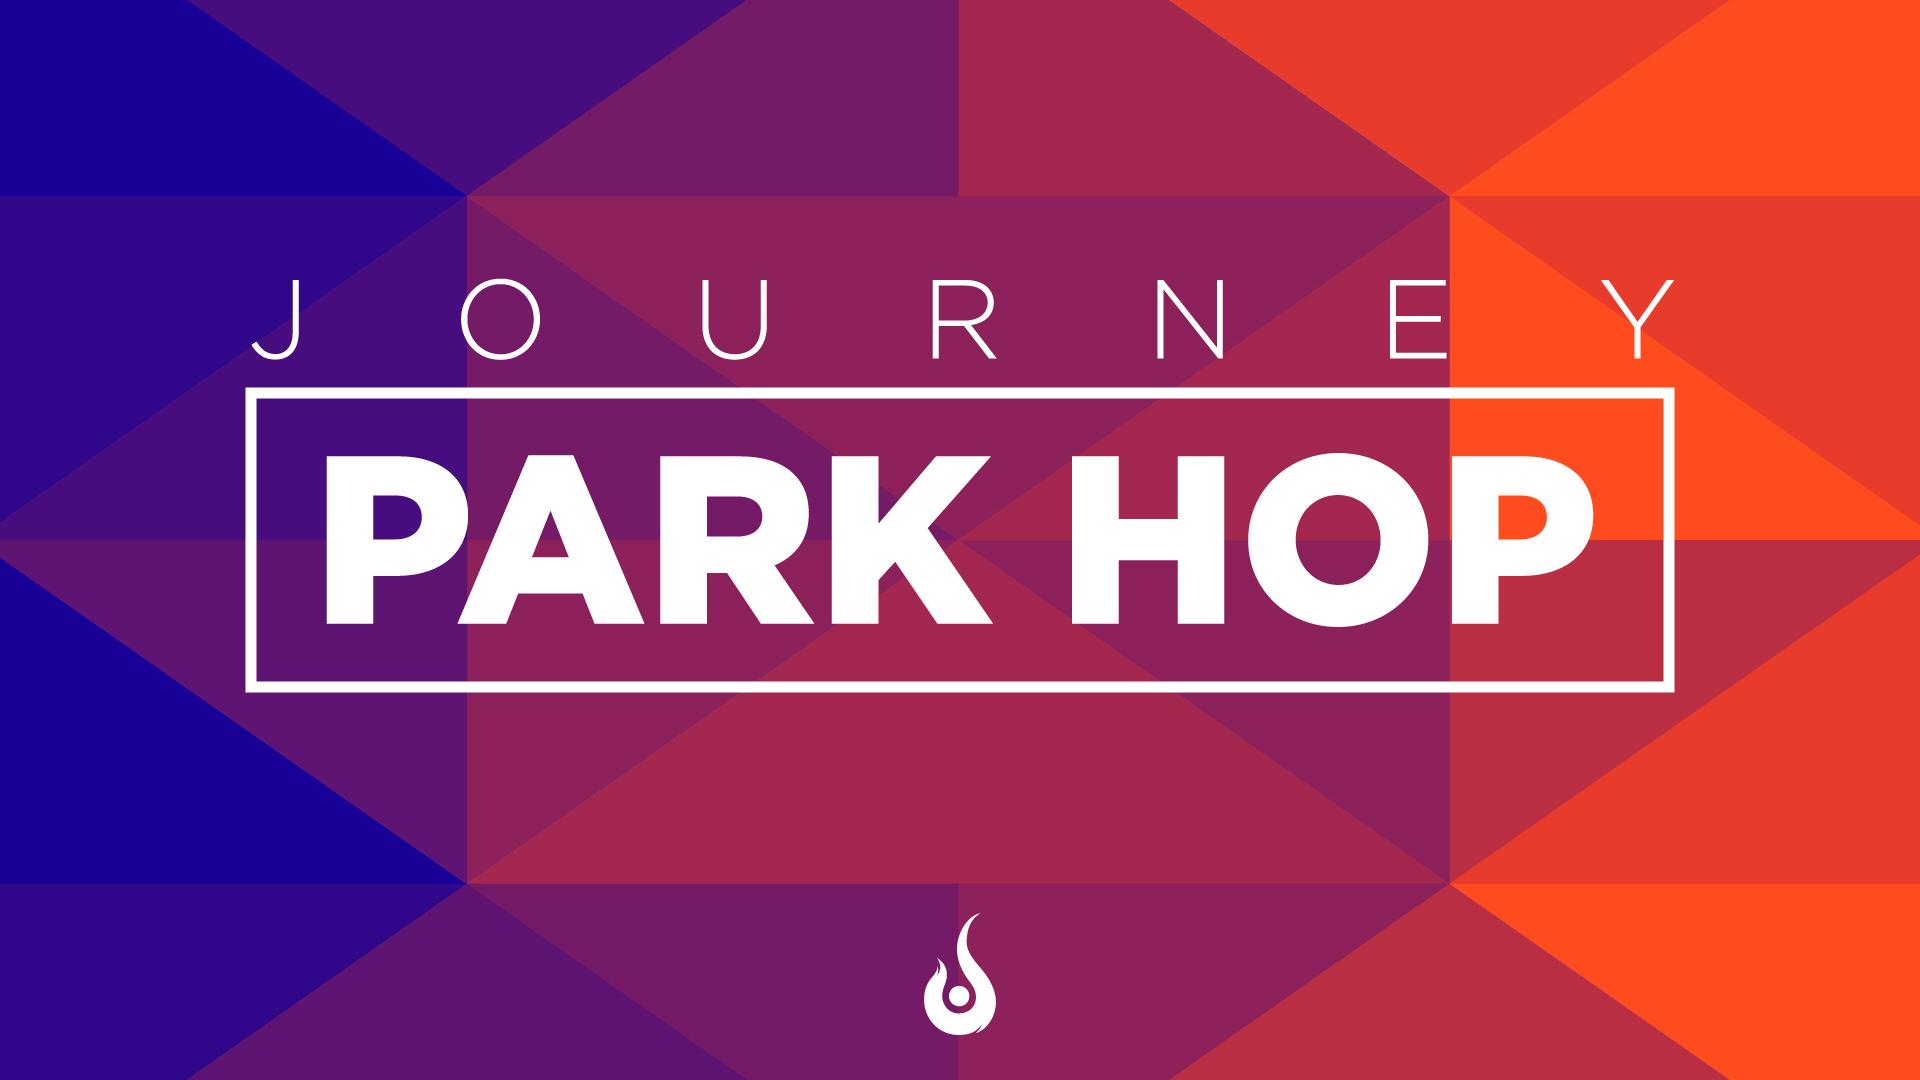 PARK-HOP-01.jpg